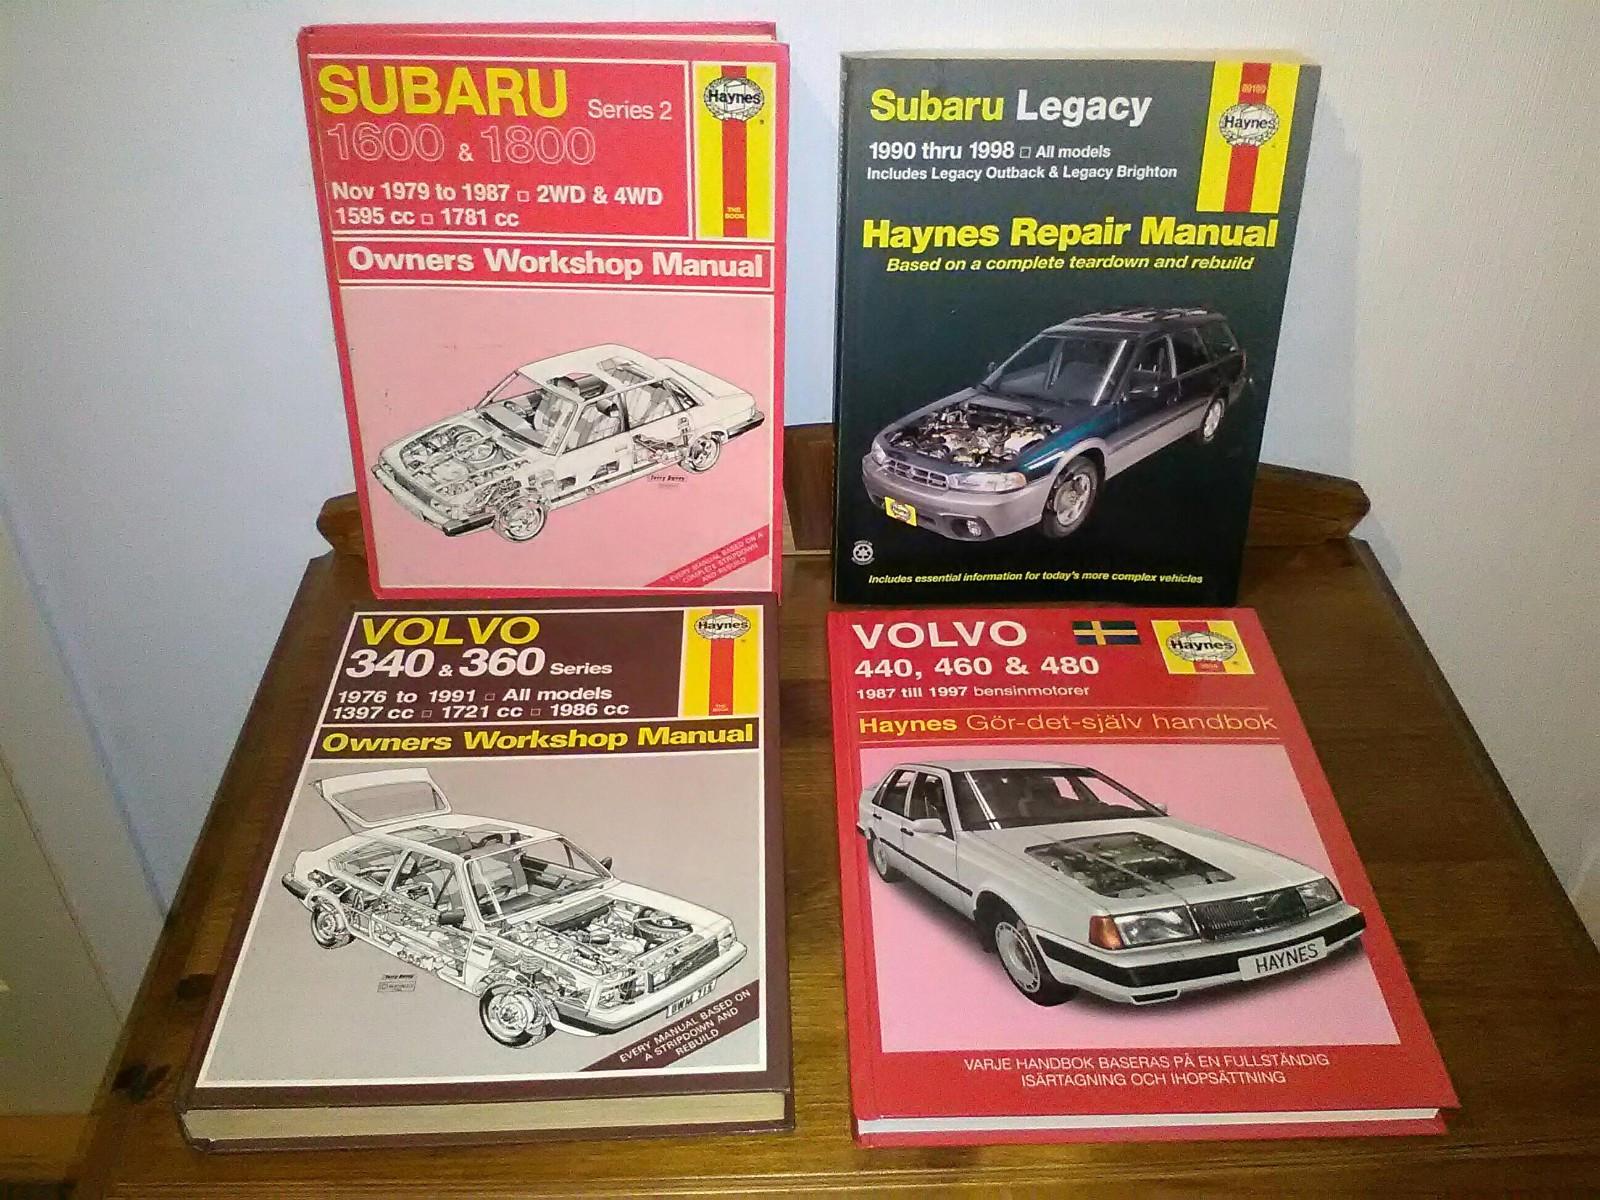 Haynes Rephndbker For Volvo 340 480subaru Legacy 1990 98 Og 1998 Subaru Outback Owners Manual 1 5